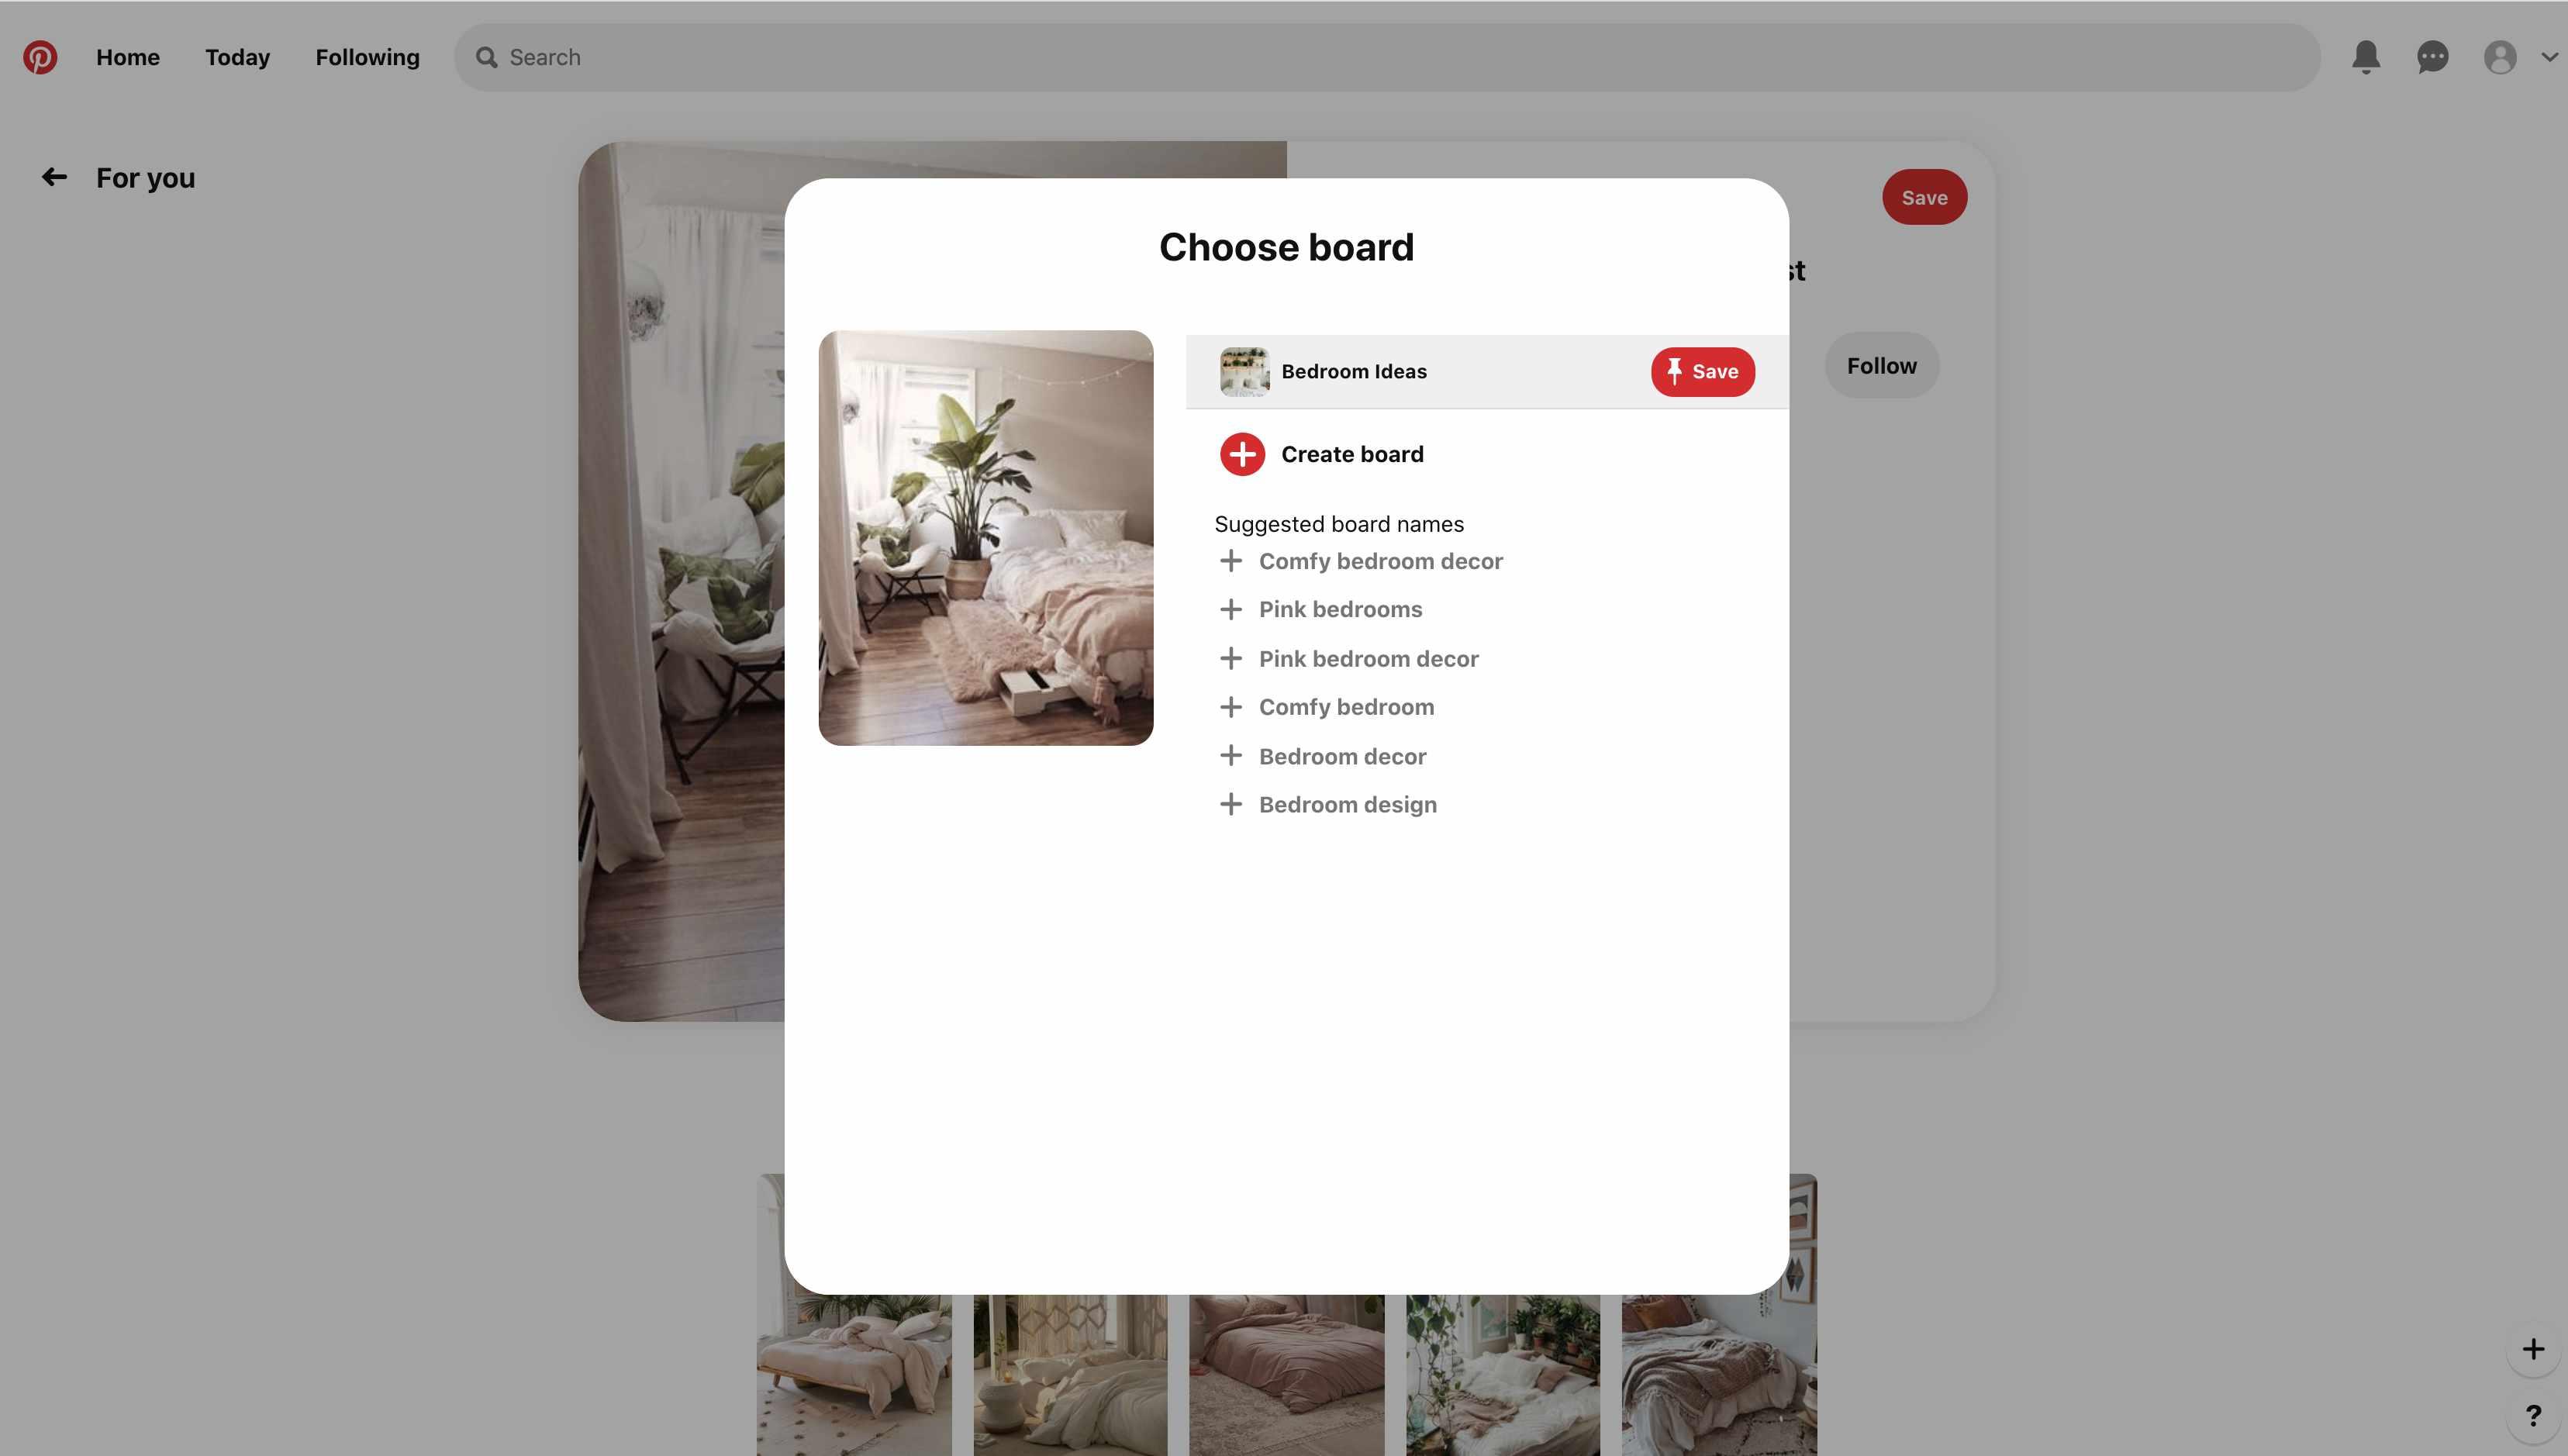 Choose a board or create a board in Pinterest